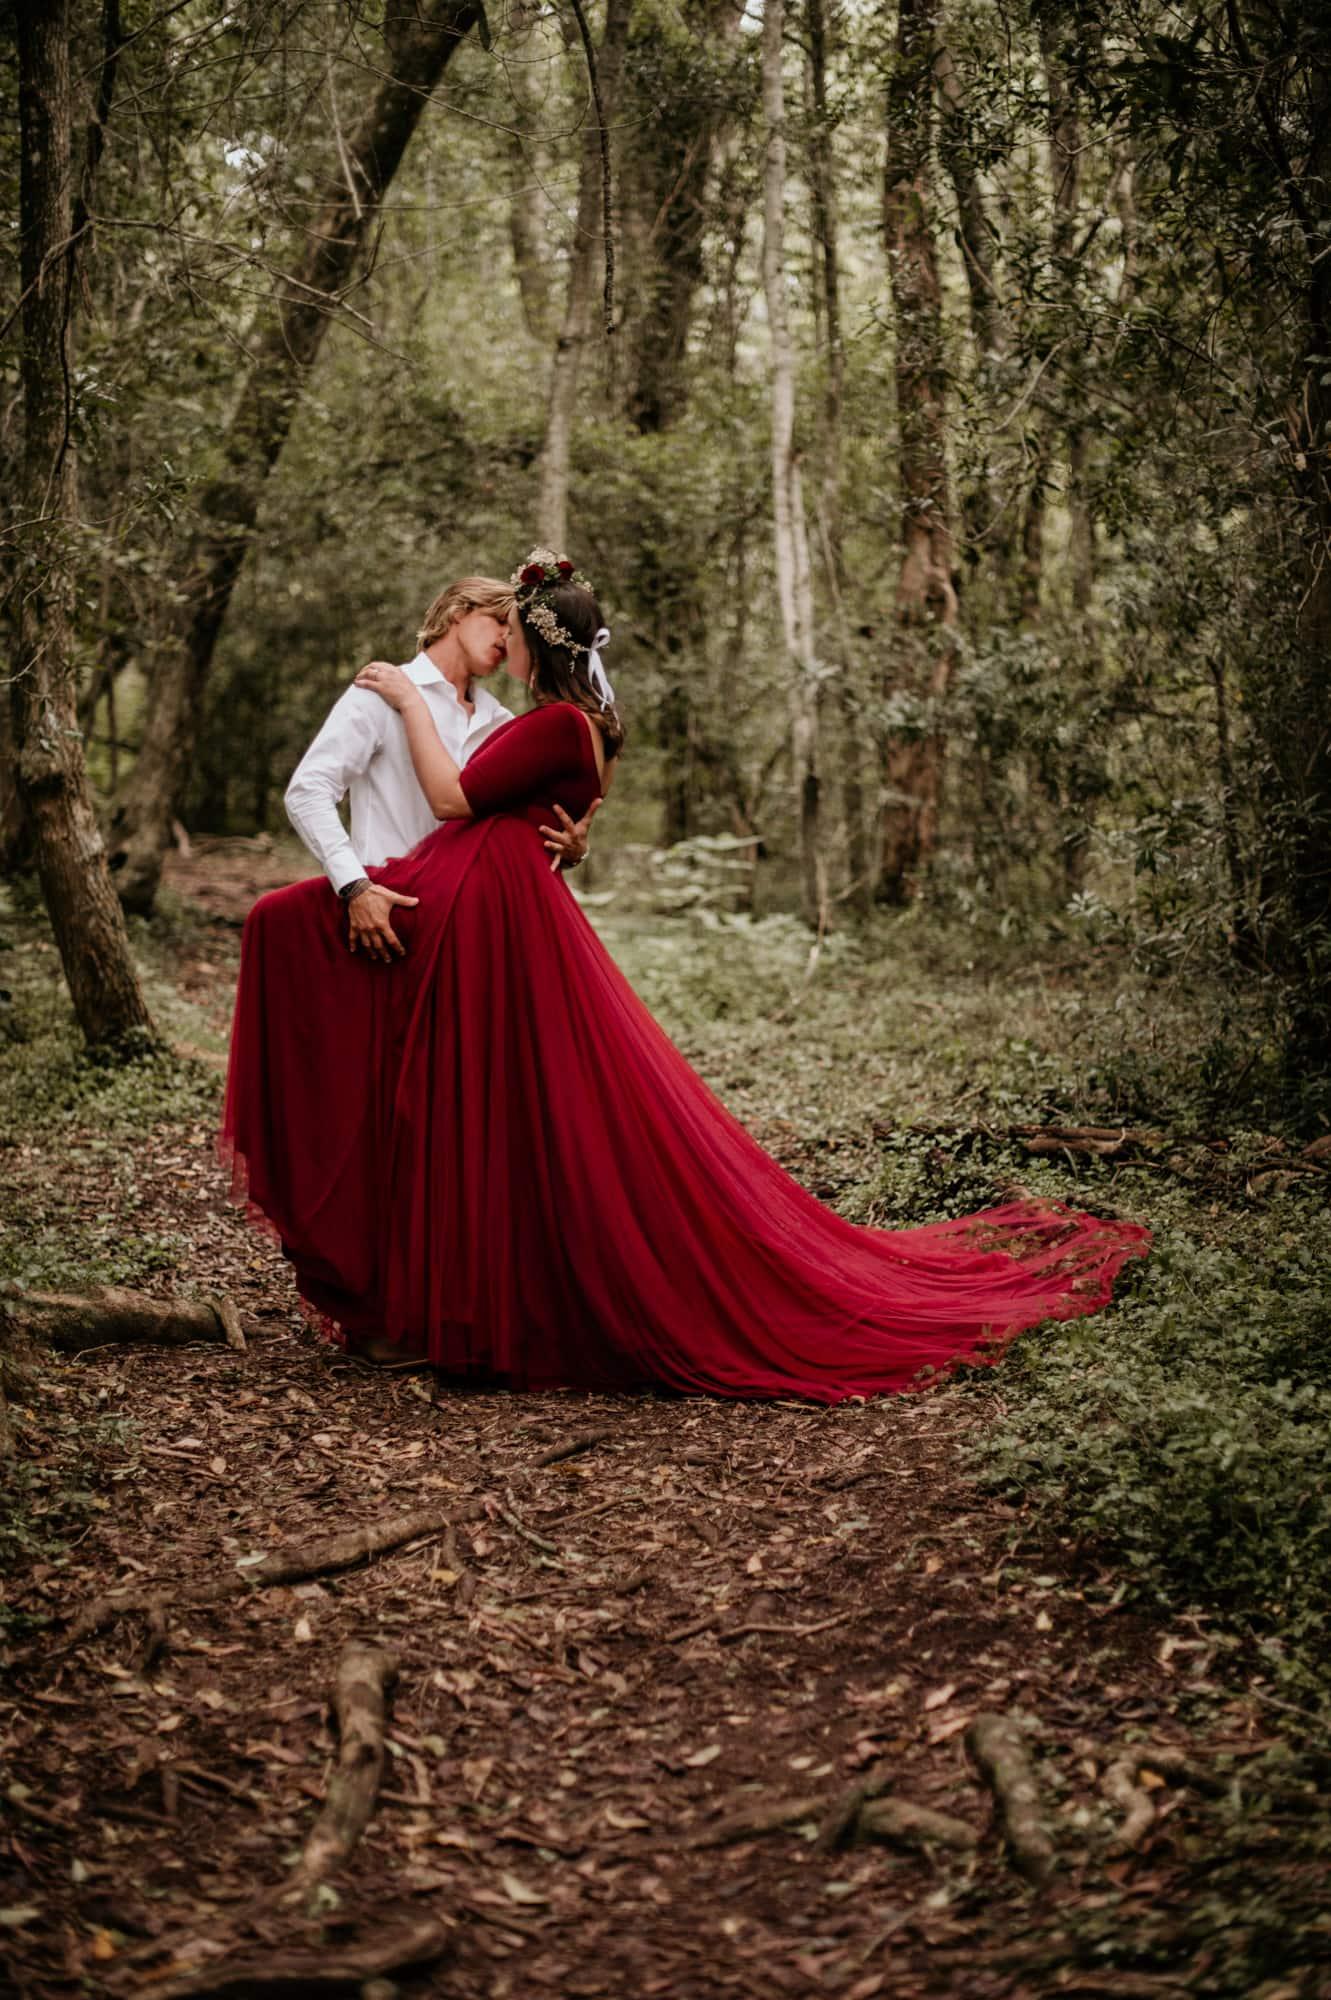 wesley-lanie-george-fernridge-engagement-June-Richards-Photography-Destination-Weddings-Elopements-Garden-Route-43